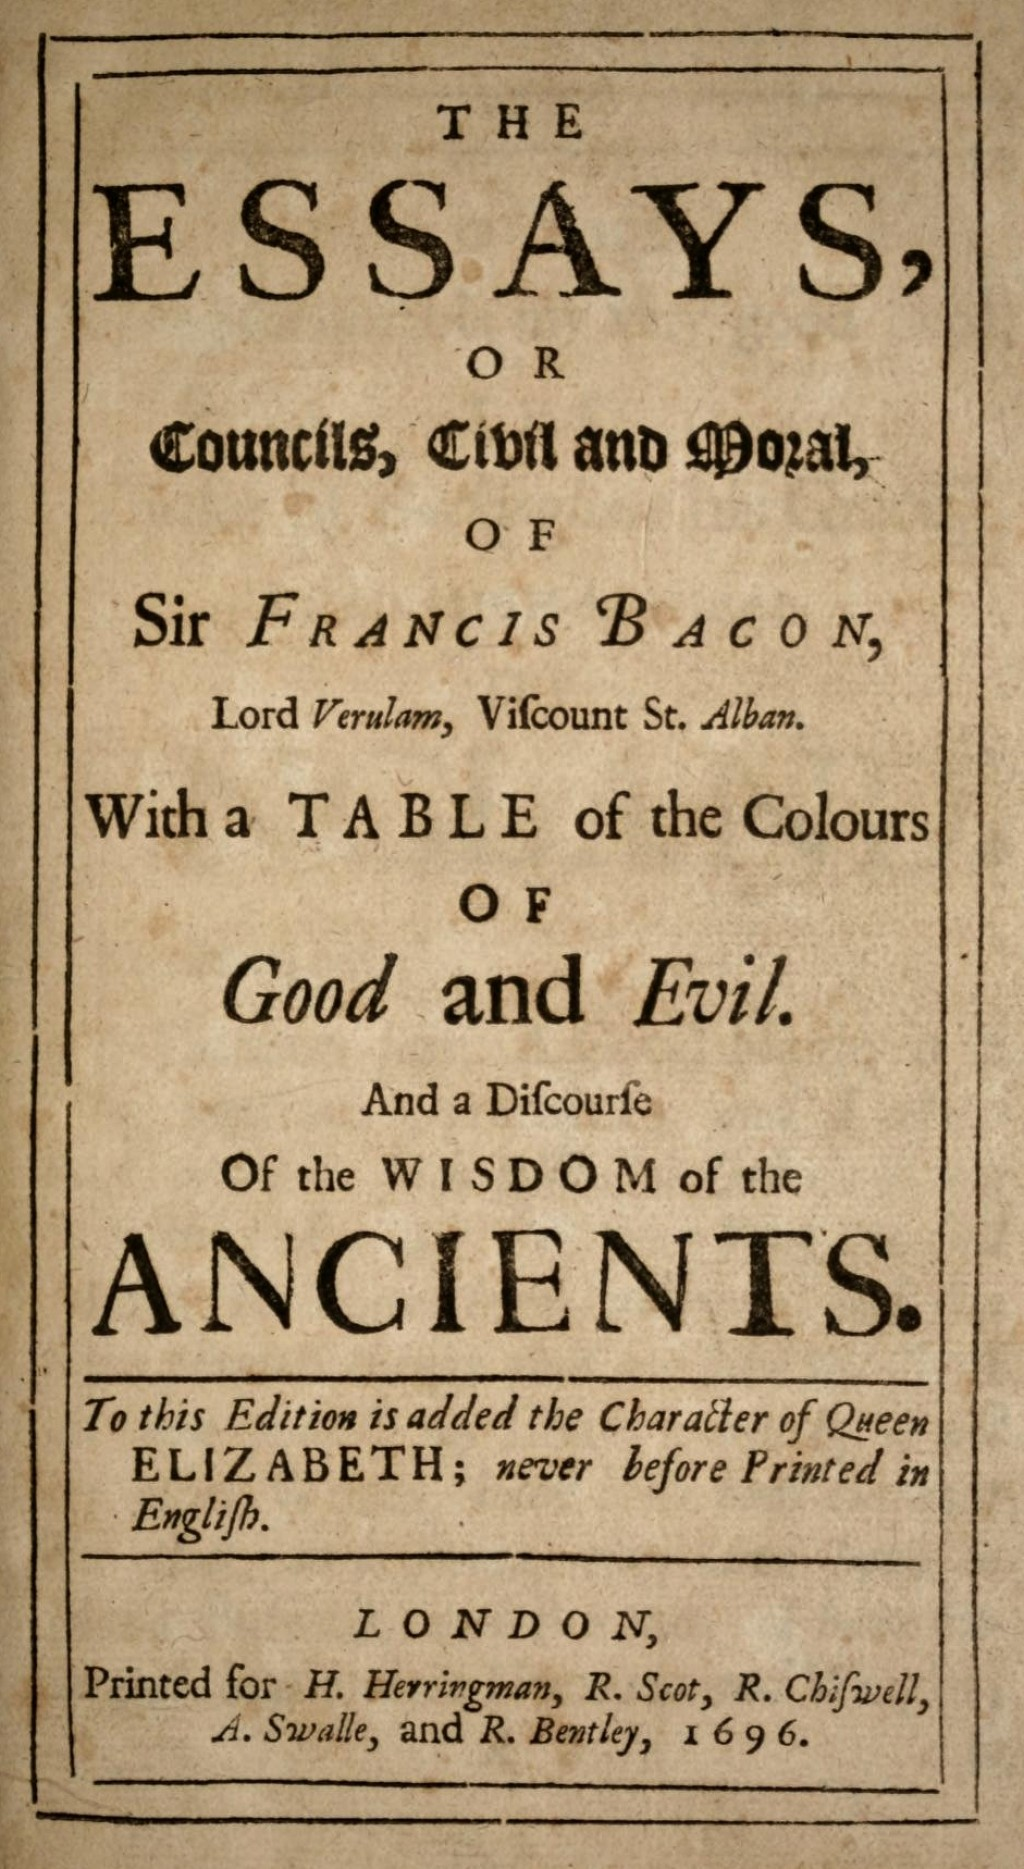 001 Bacons Essays Bacon 1696 Essay Amazing Francis Google Books Of Truth Quiz Bacon's Summary Large